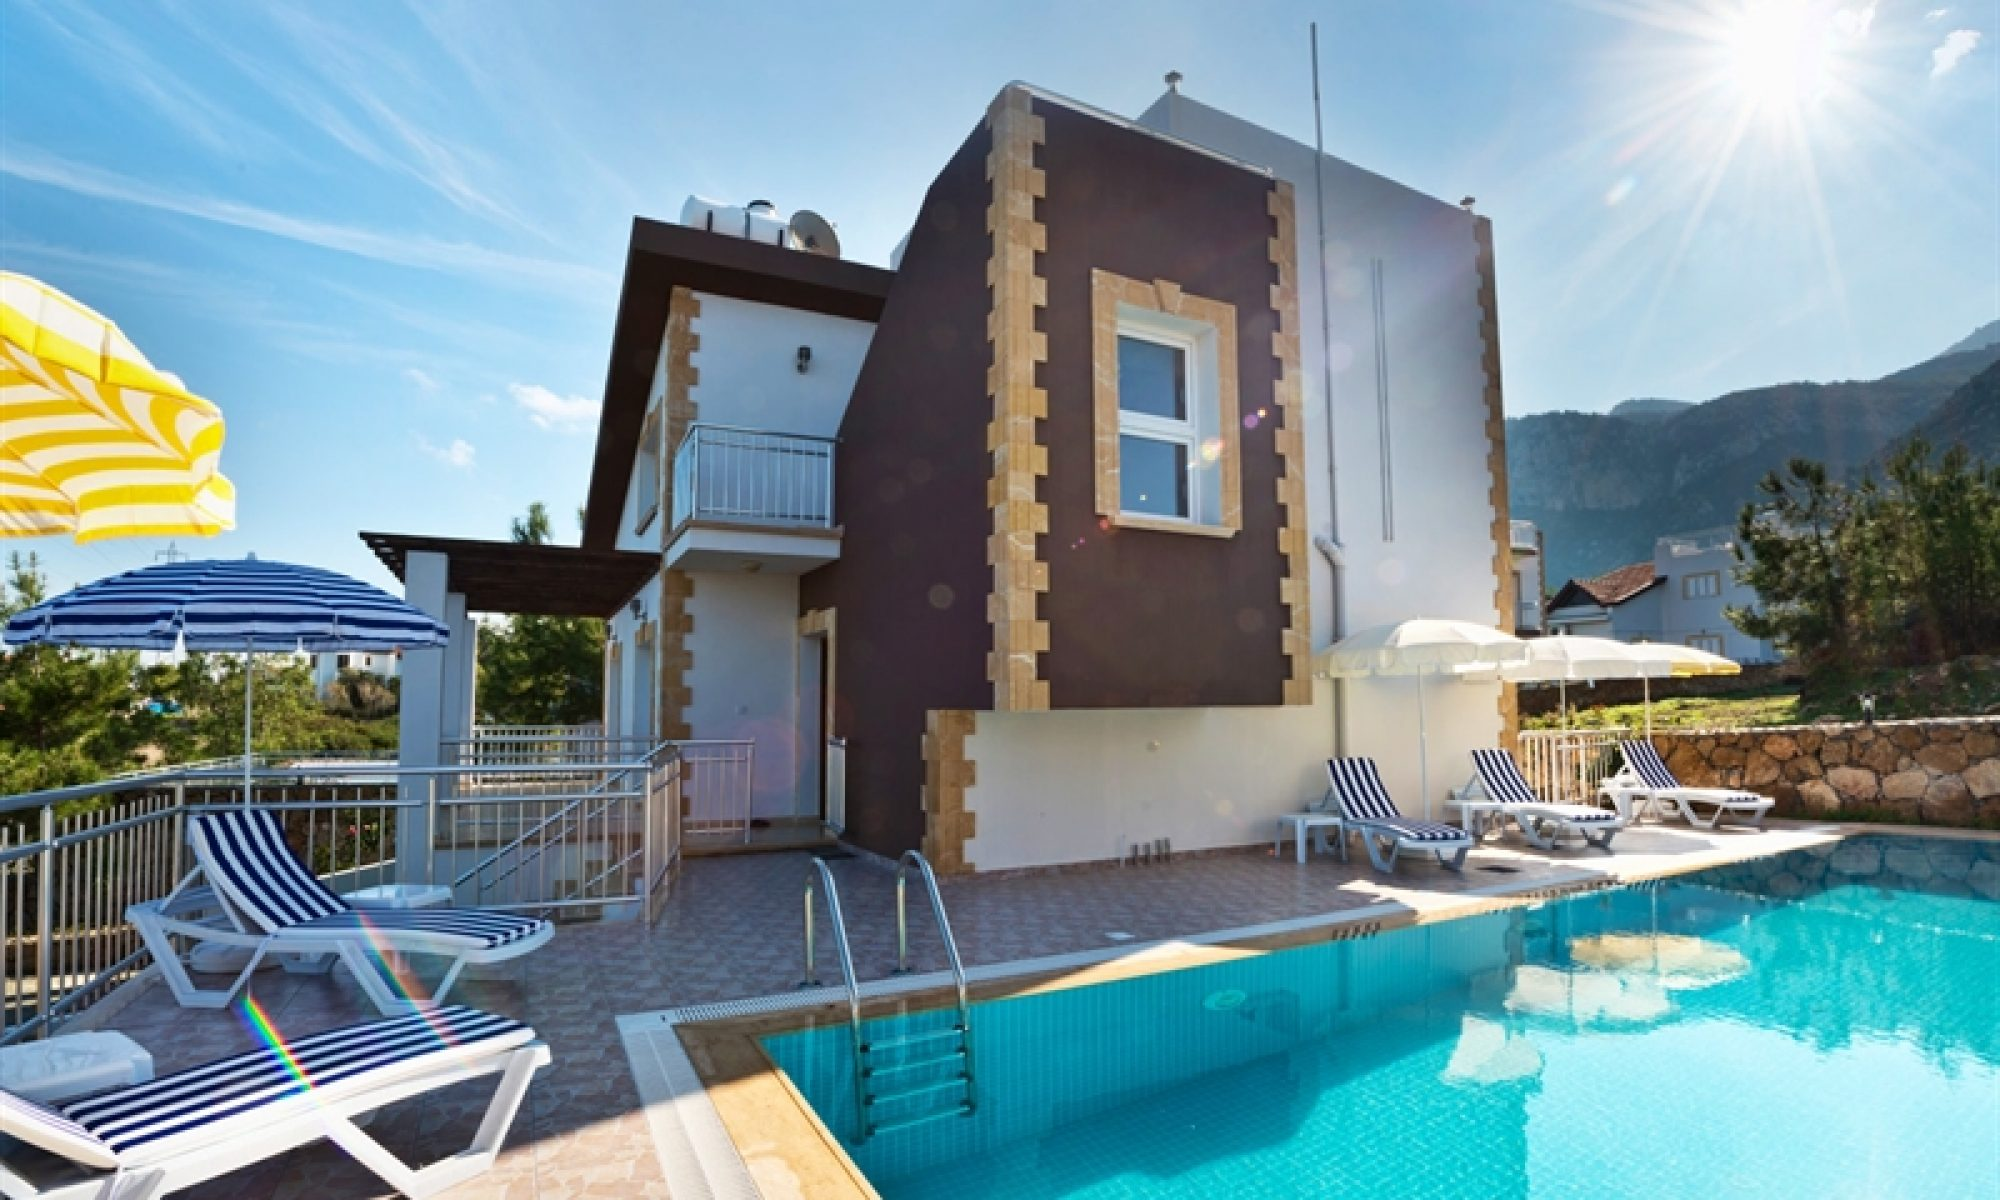 Kıbrıs'ta Yazlık Villa Kiralama